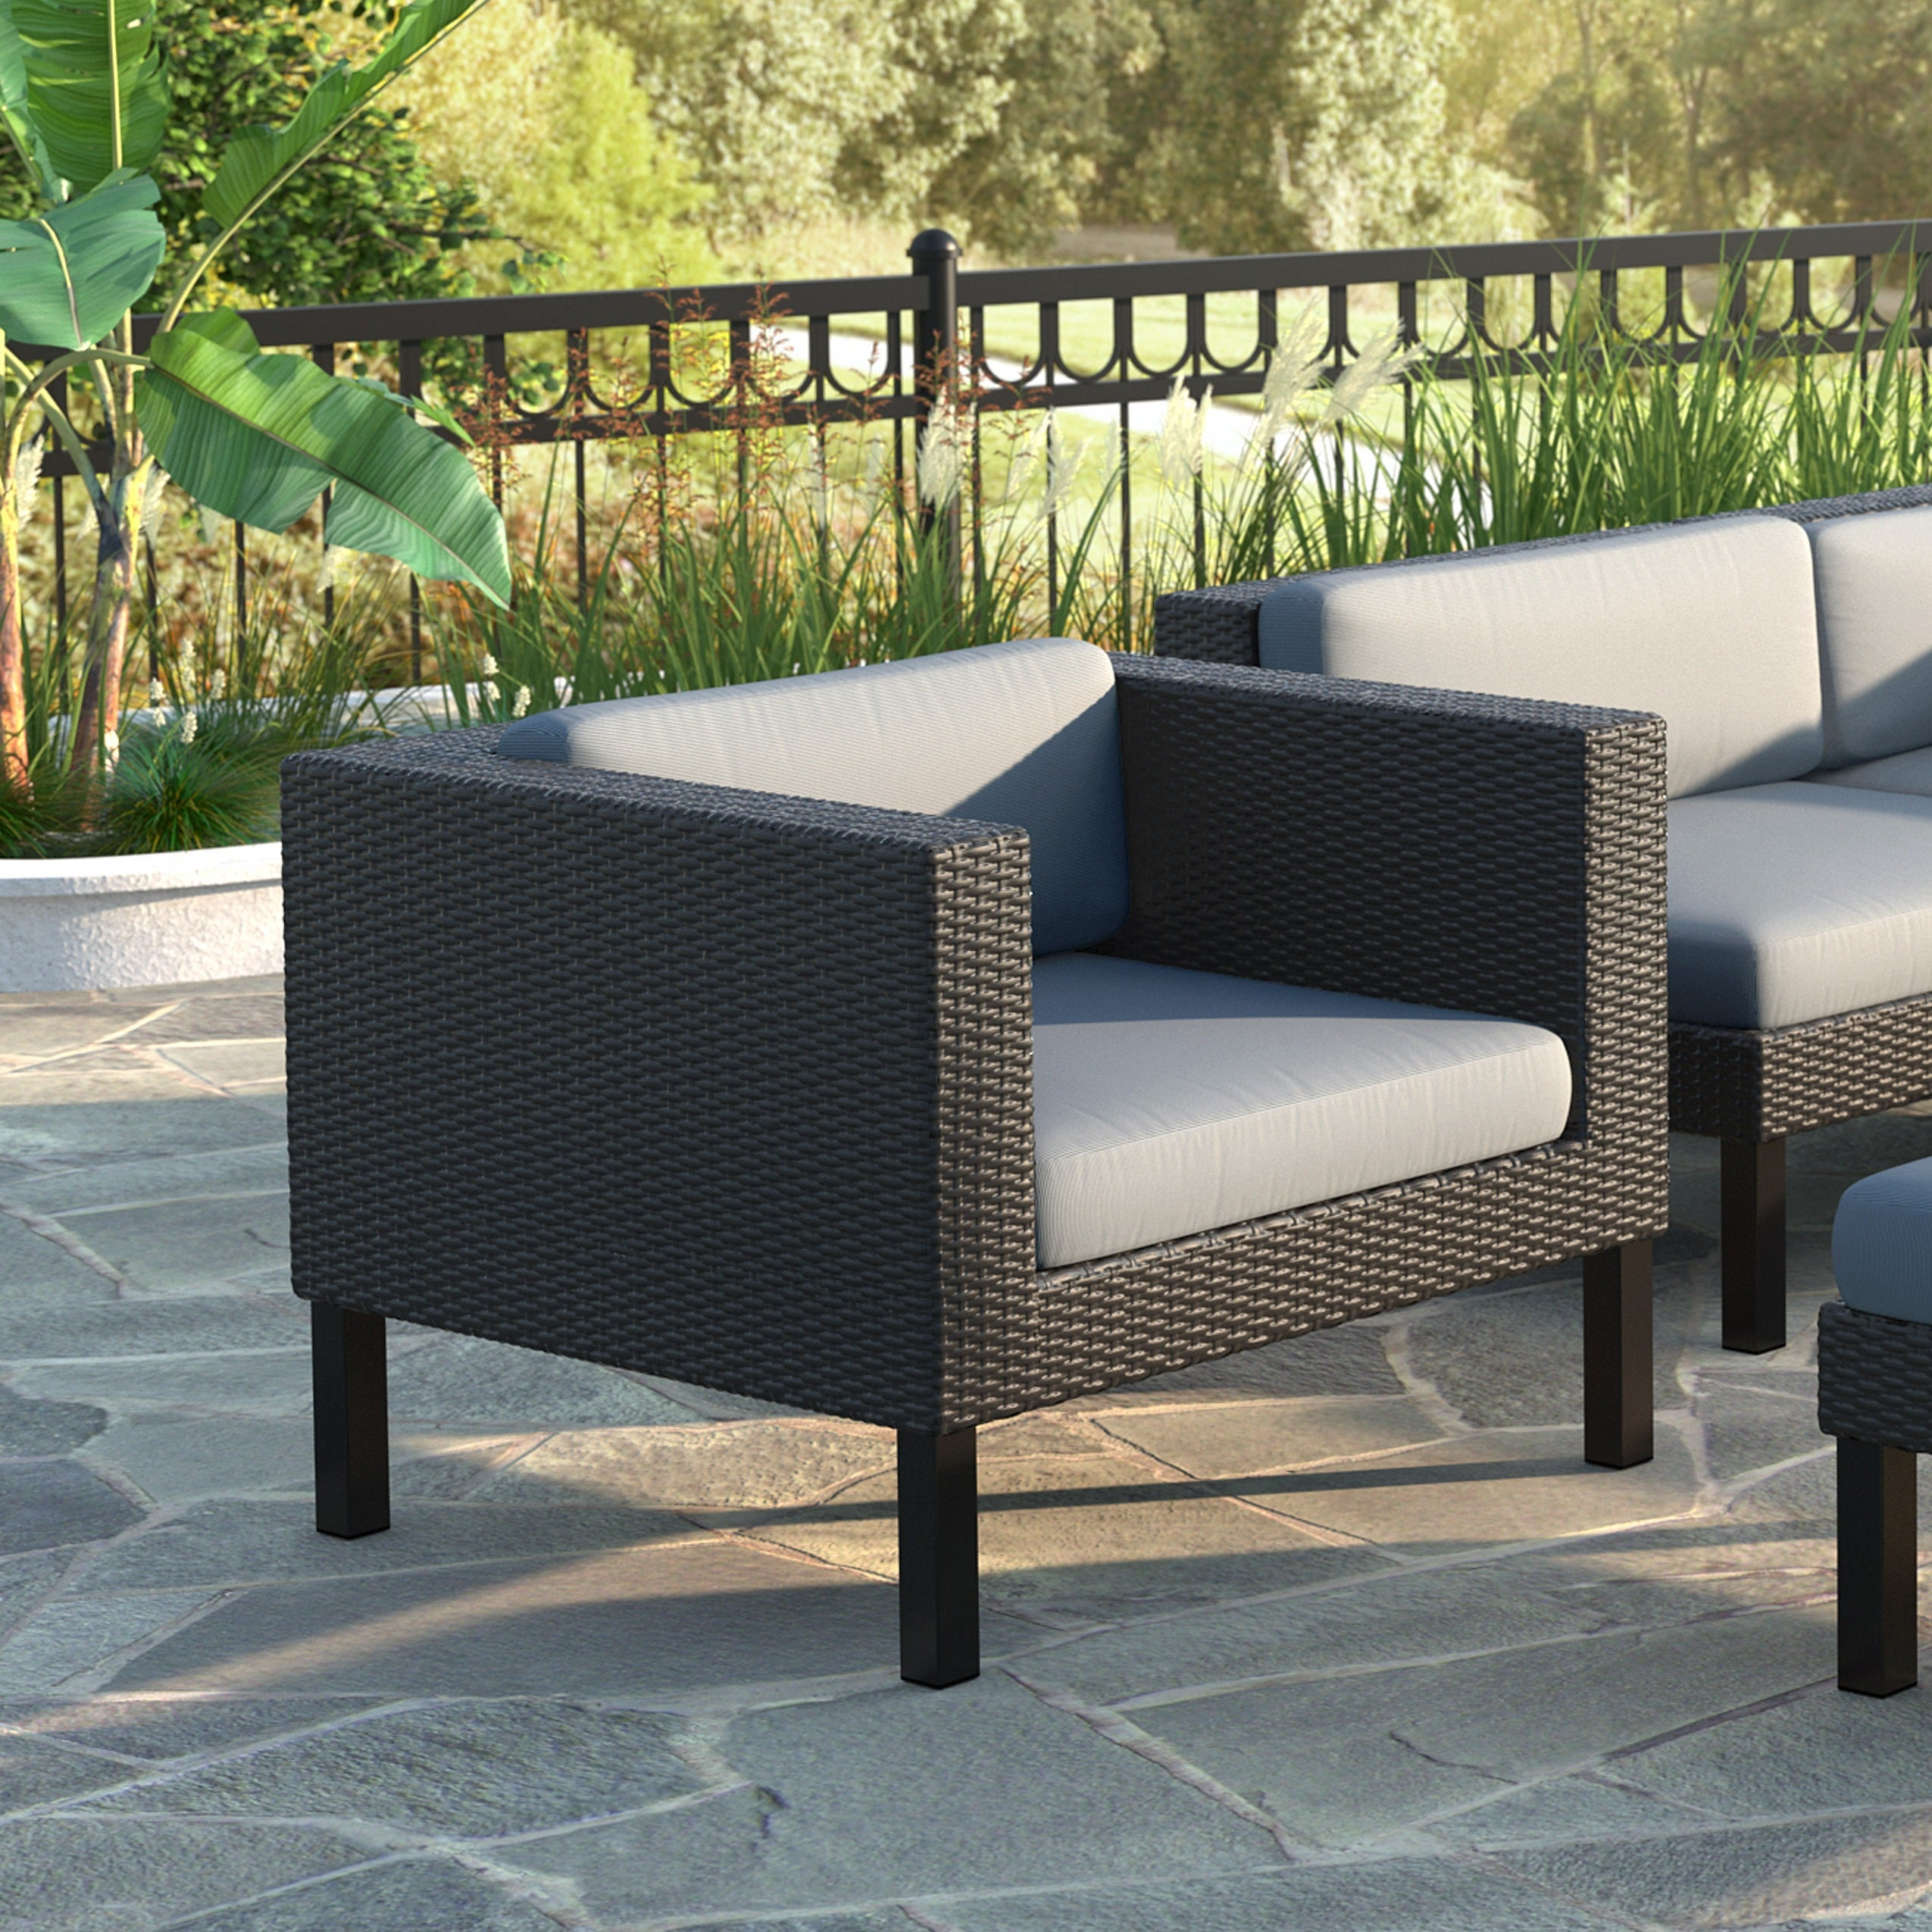 Brilliant Oakland Patio Chair In Textured Black Weave Dove Grey Cushions Machost Co Dining Chair Design Ideas Machostcouk